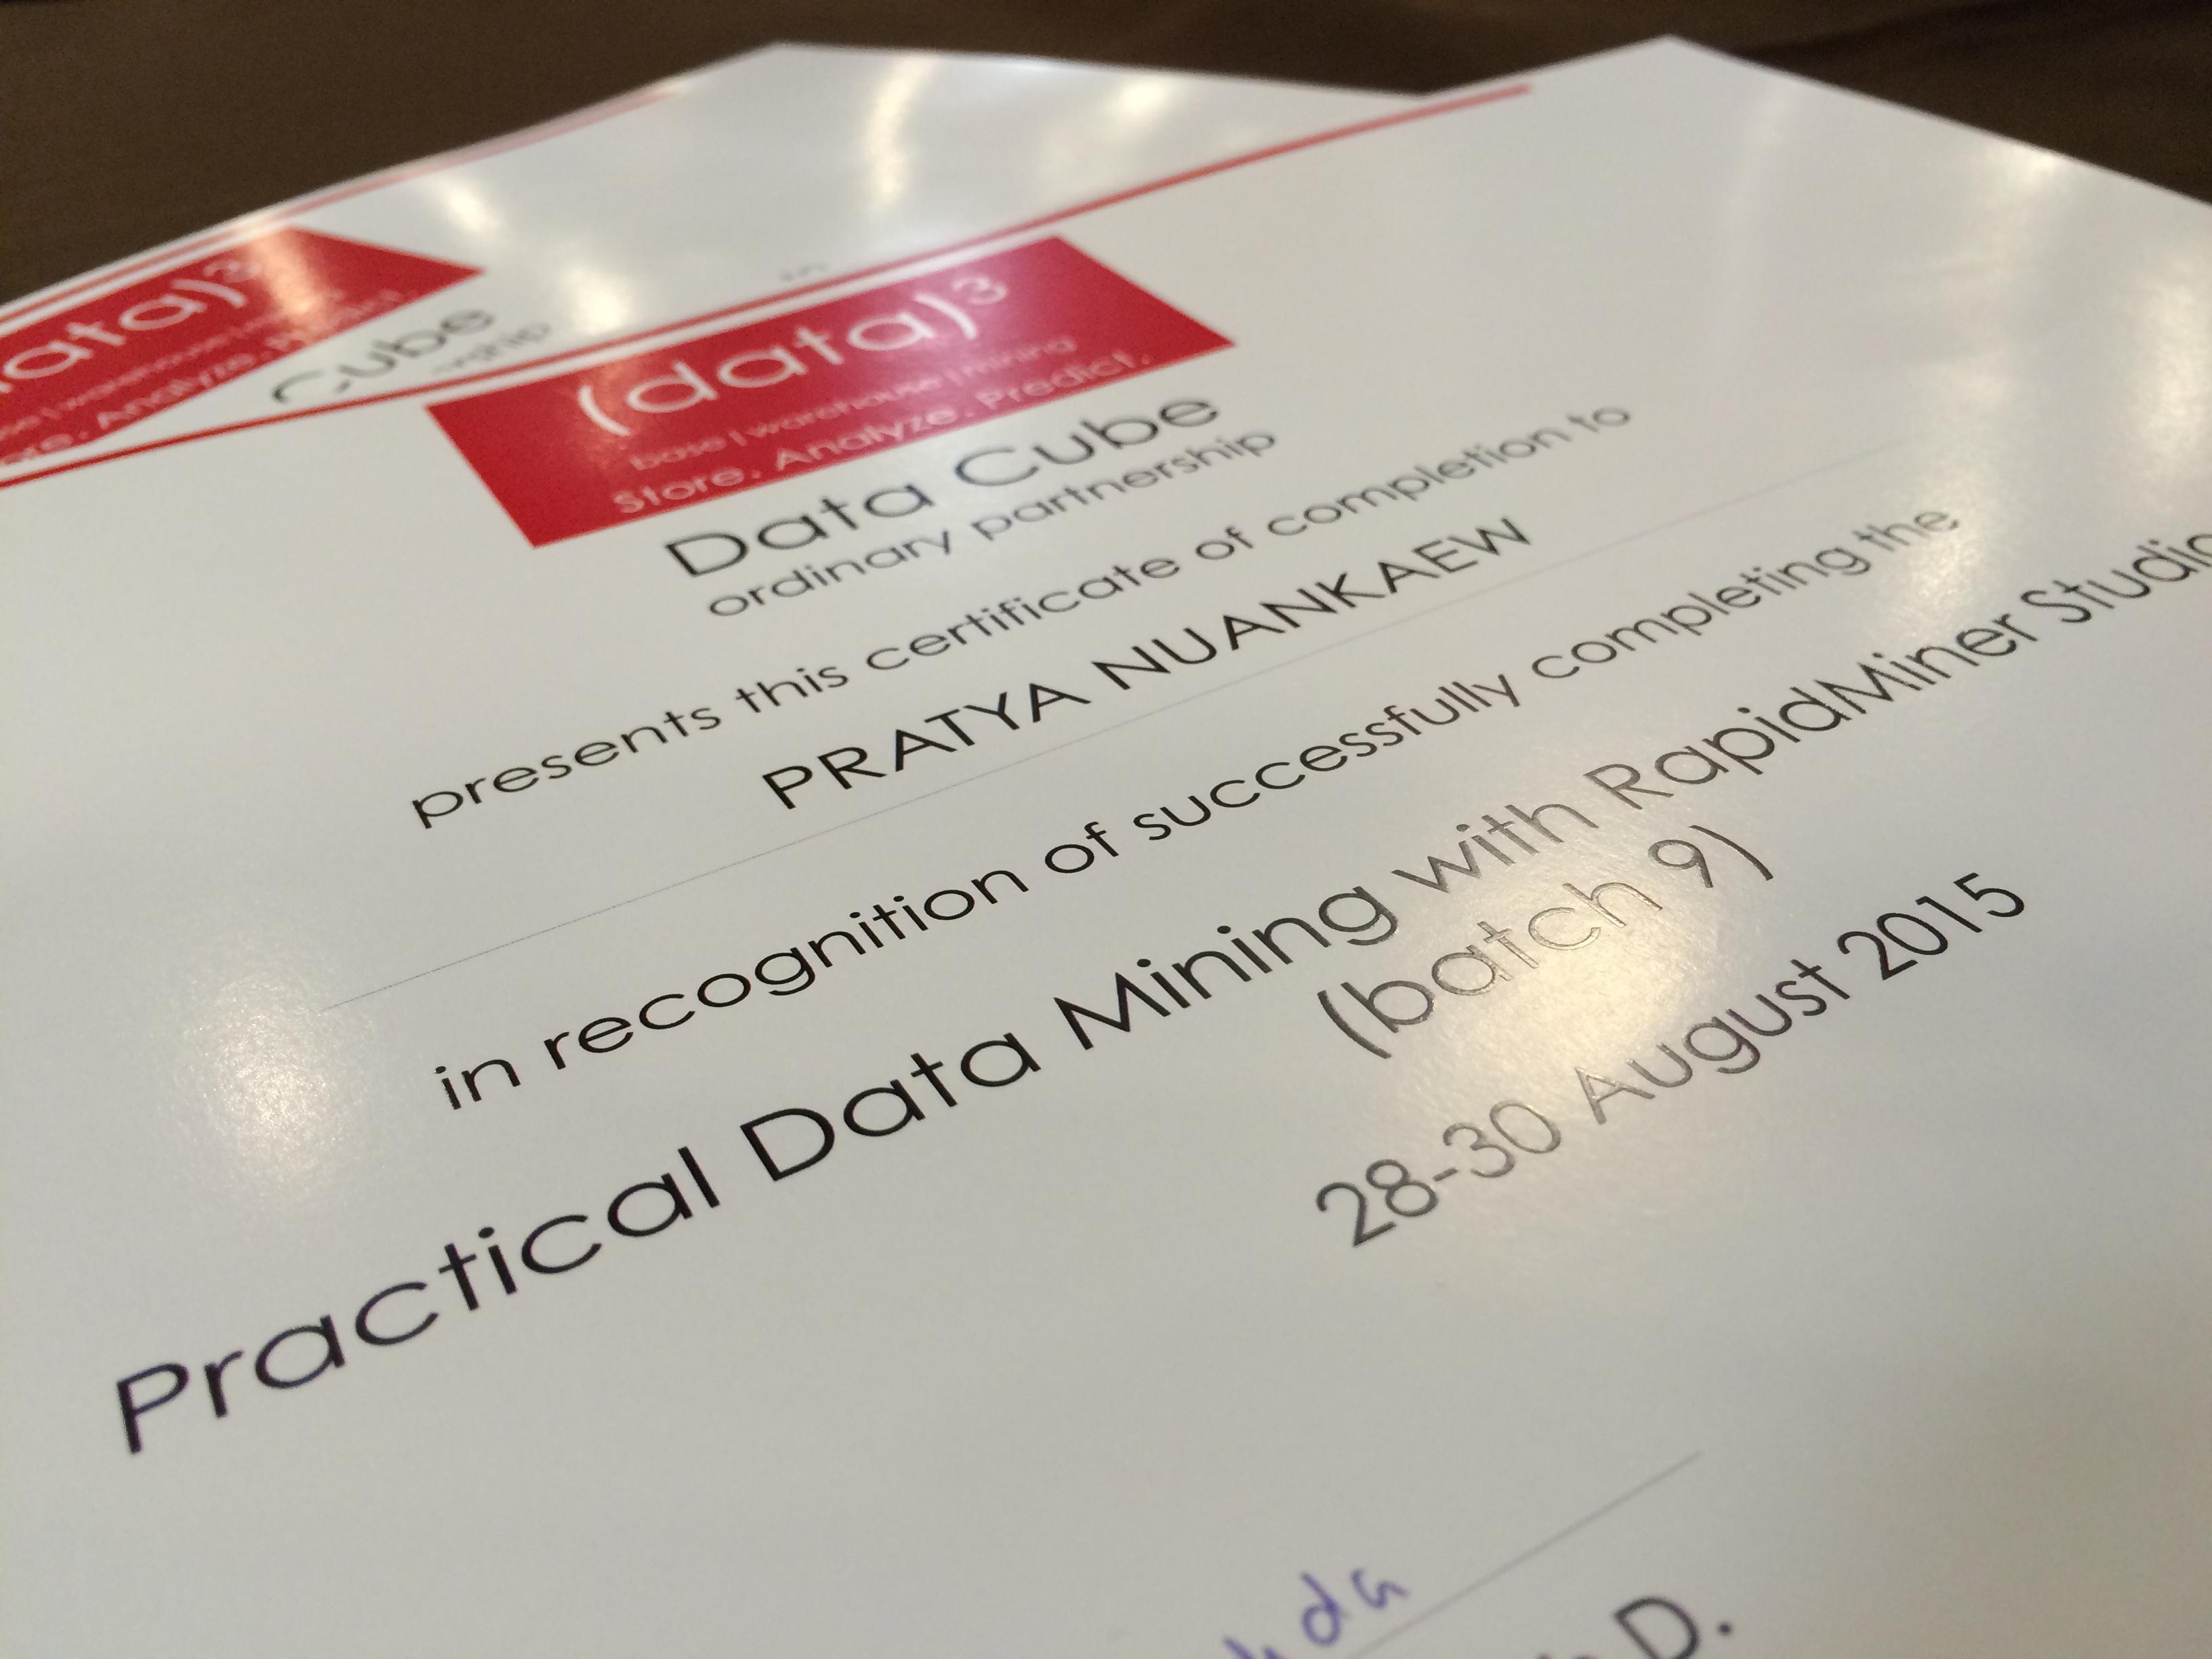 Certification Pratya Nuankaew